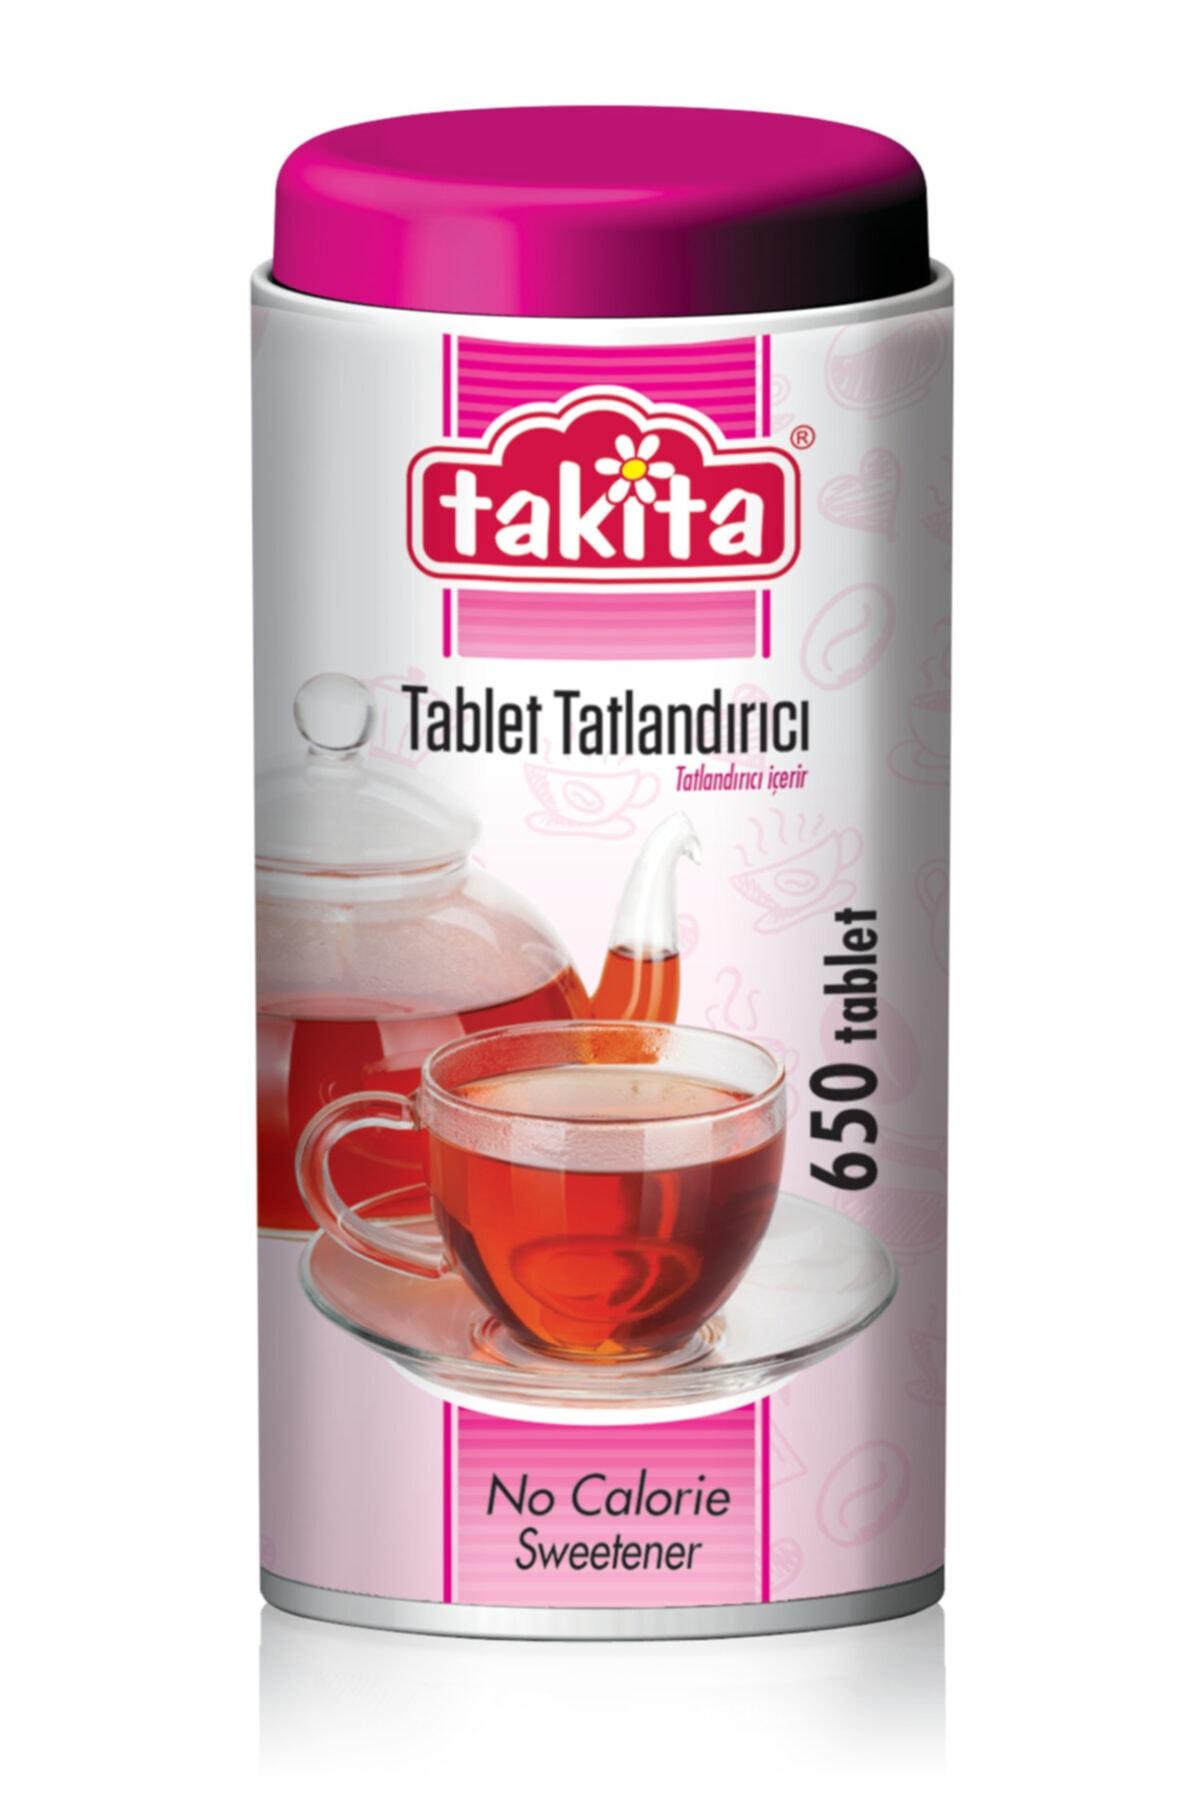 Takita Tablet Tatlandırıcı 650 Tablet 1